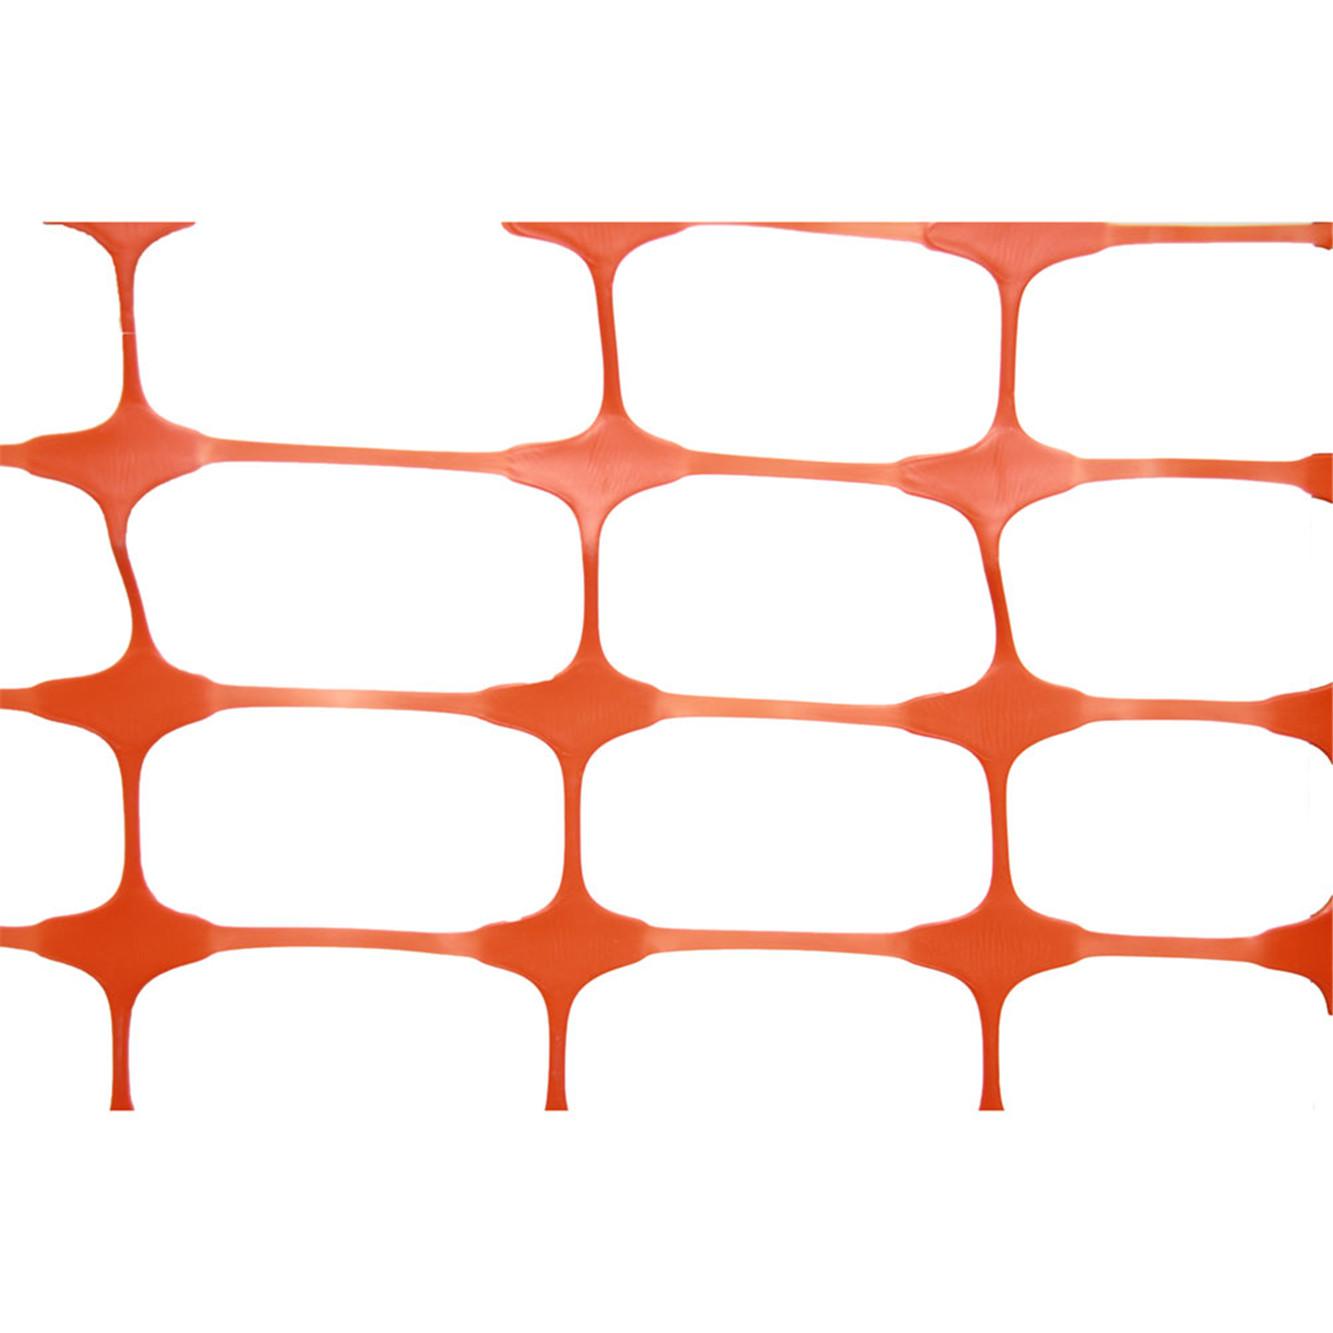 Orange Barrier / Safety Fencing / Snow Fence